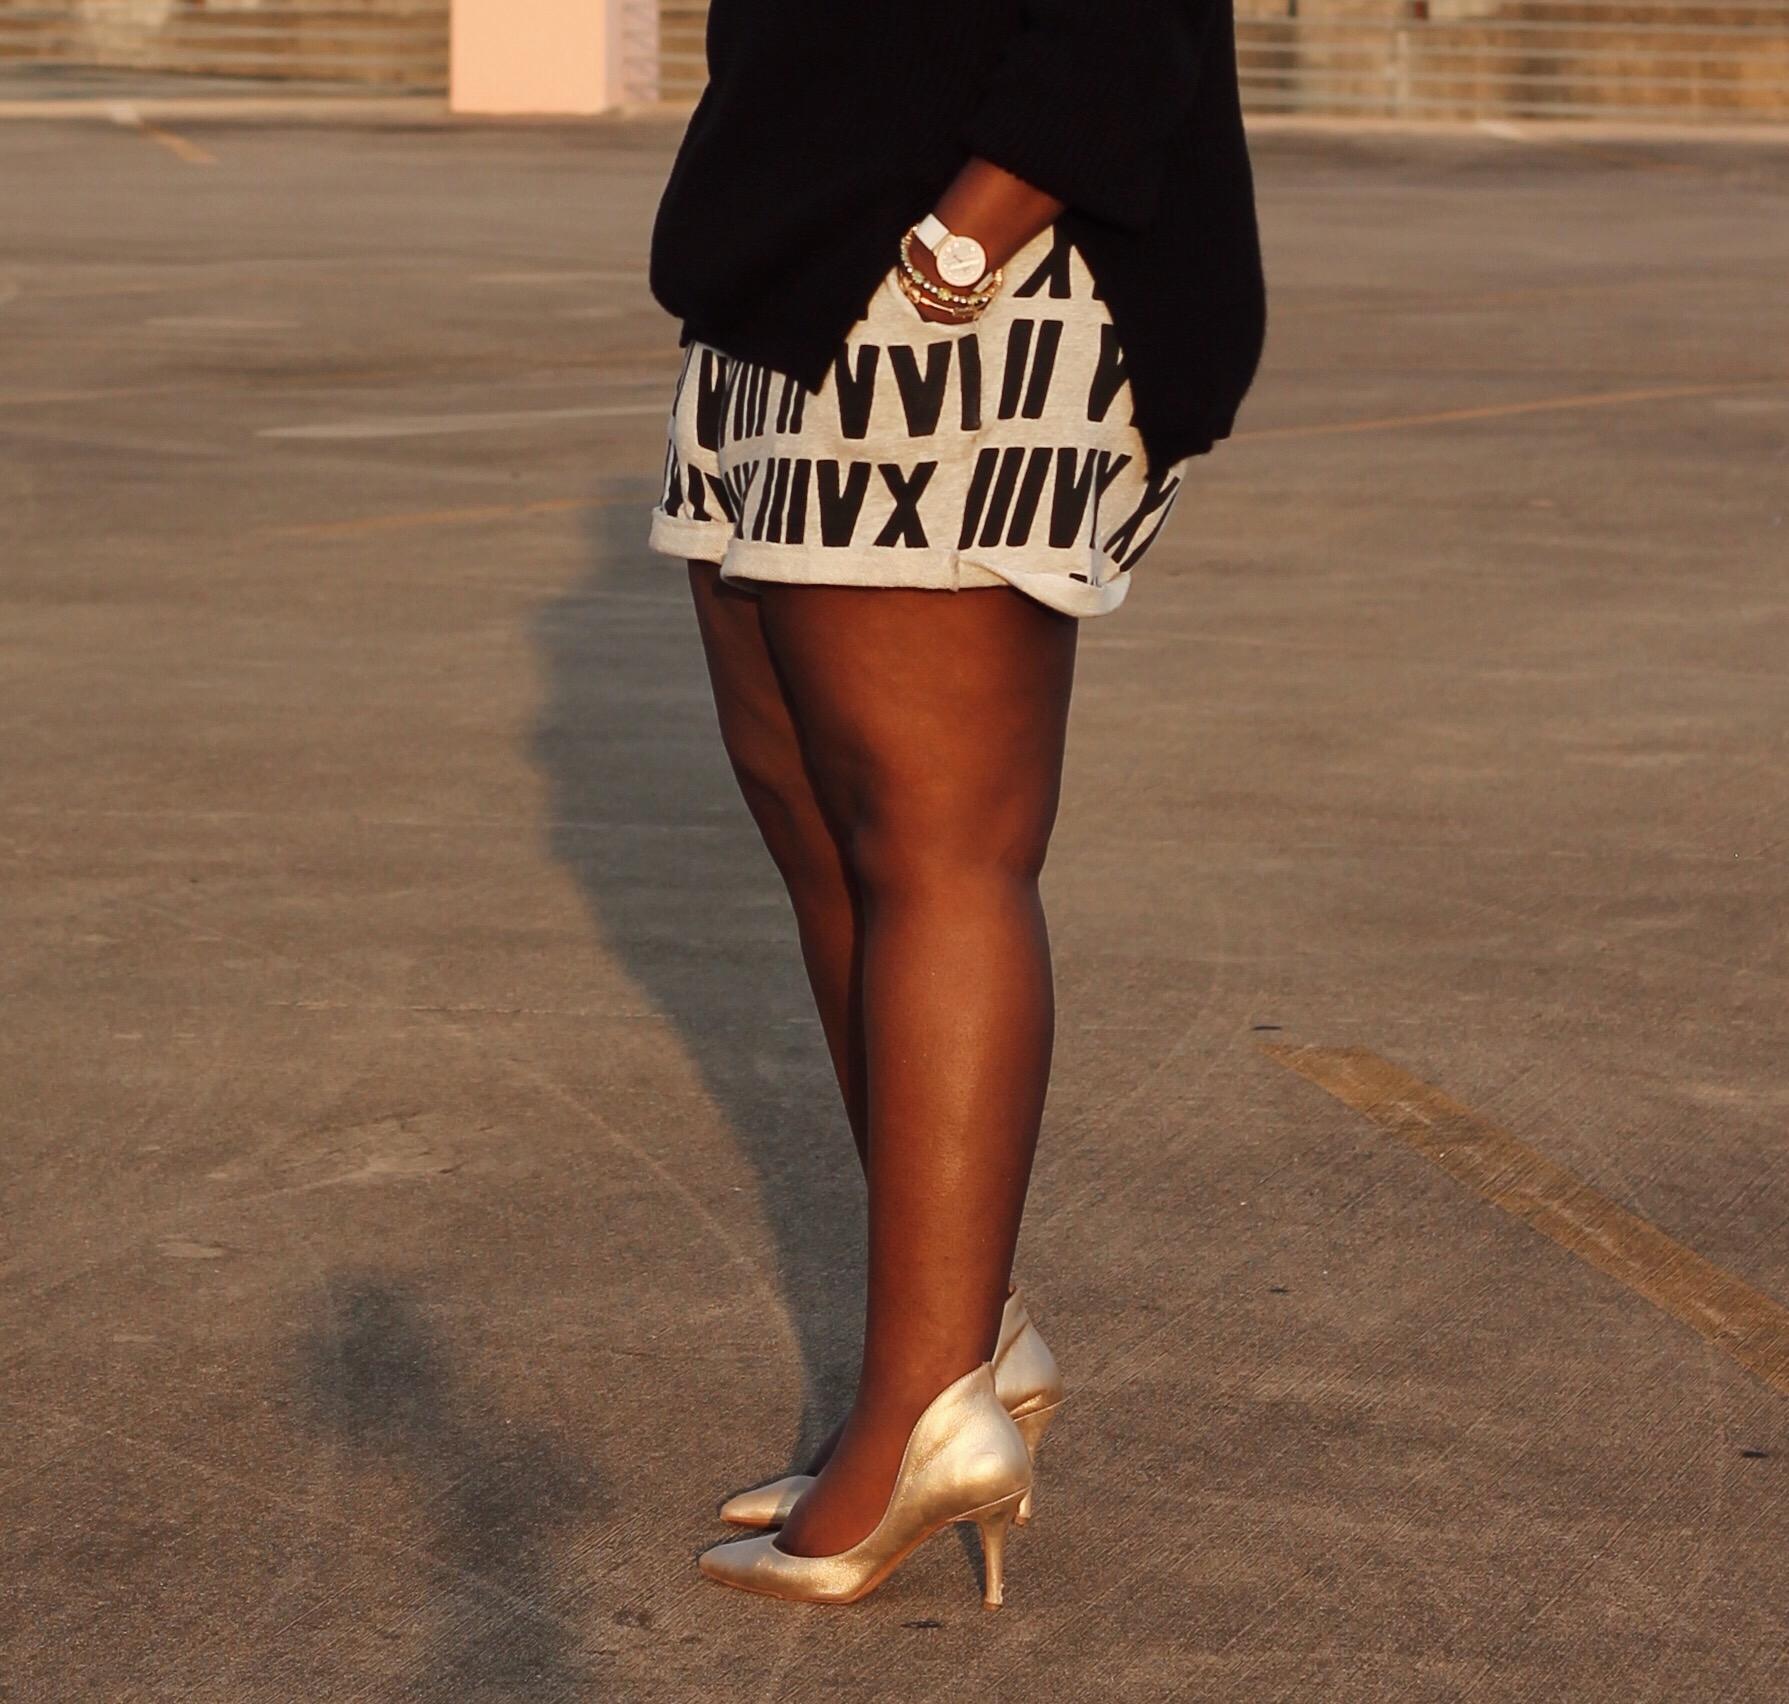 plus size black bloggers, clothes for curvy girls, curvy girl fashion clothing, plus blog, plus size fashion tips, plus size women blog, at fashion blog, plus size high fashion, curvy women fashion, plus blog, curvy girl fashion blog, style plus curves, plus size fashion instagram, curvy girl blog, bbw blog, plus size street fashion, plus size beauty blog, plus size fashion ideas, curvy girl summer outfits, plus size fashion magazine, plus fashion bloggers, boohoo, rebdolls bodycon maxi dresses, birthday post